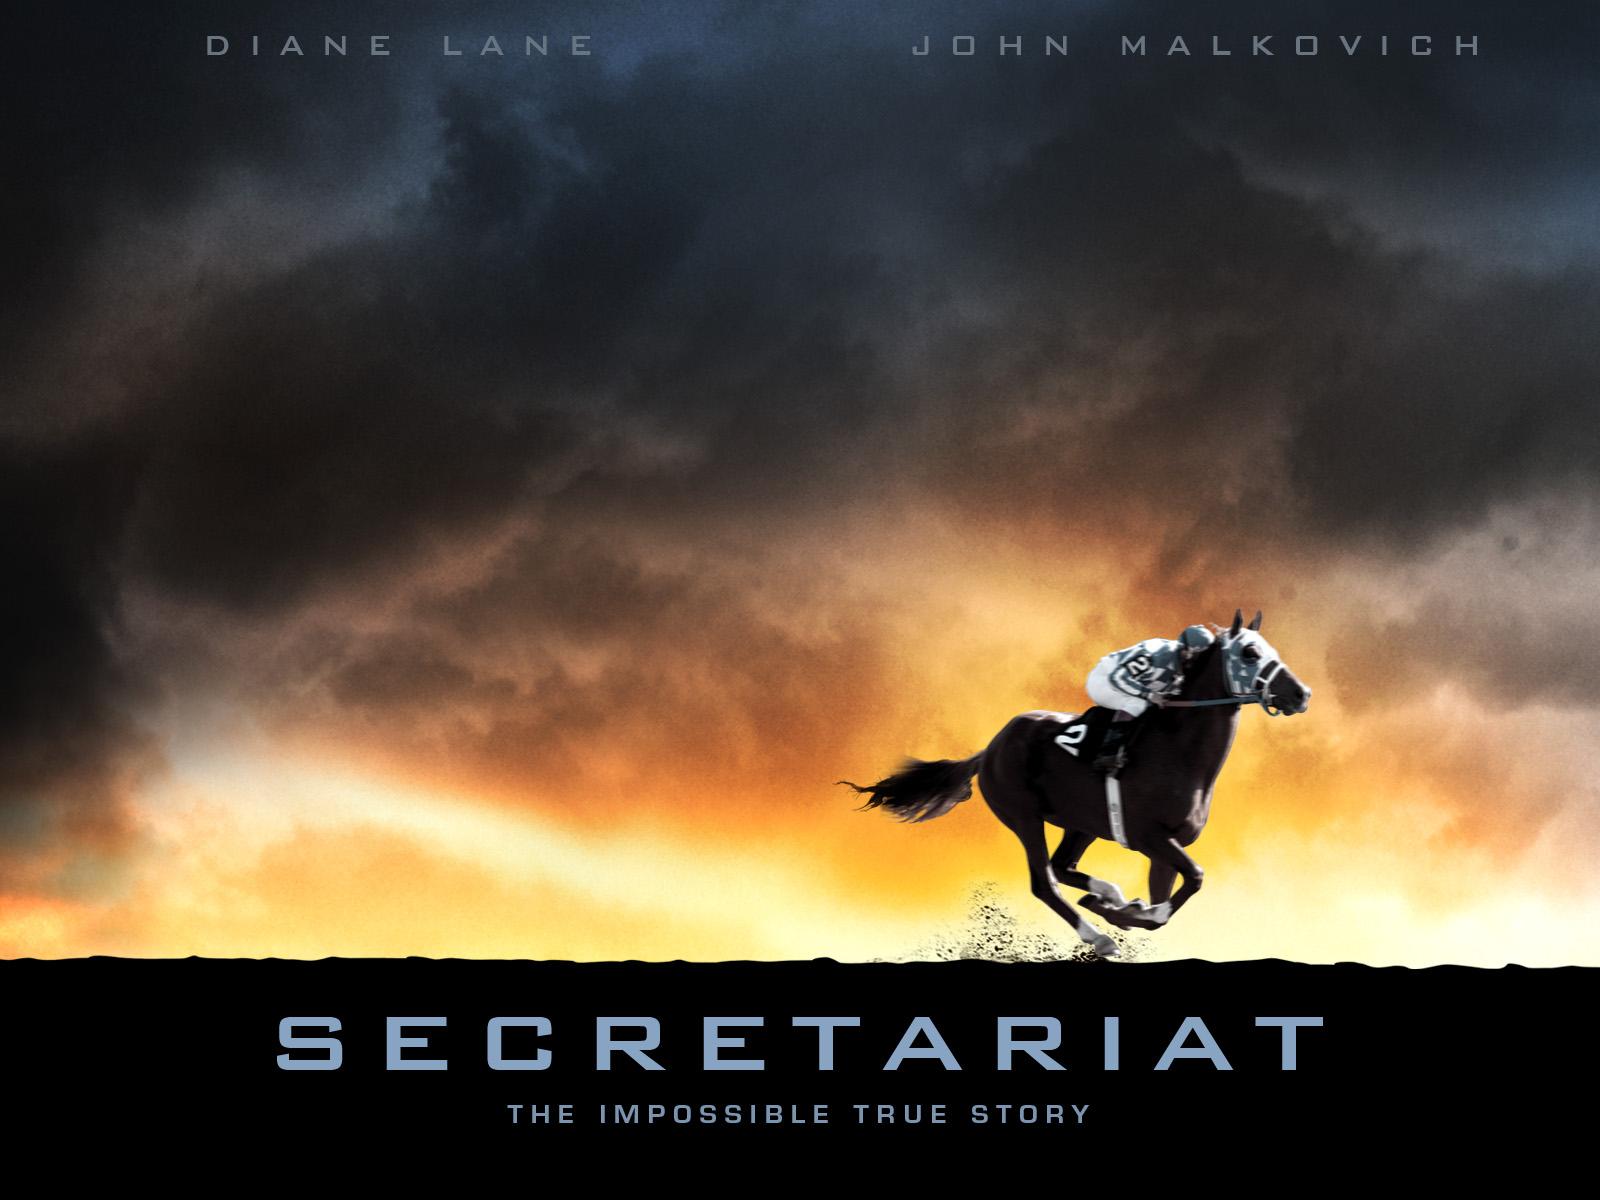 secretariat wallpaper - photo #8